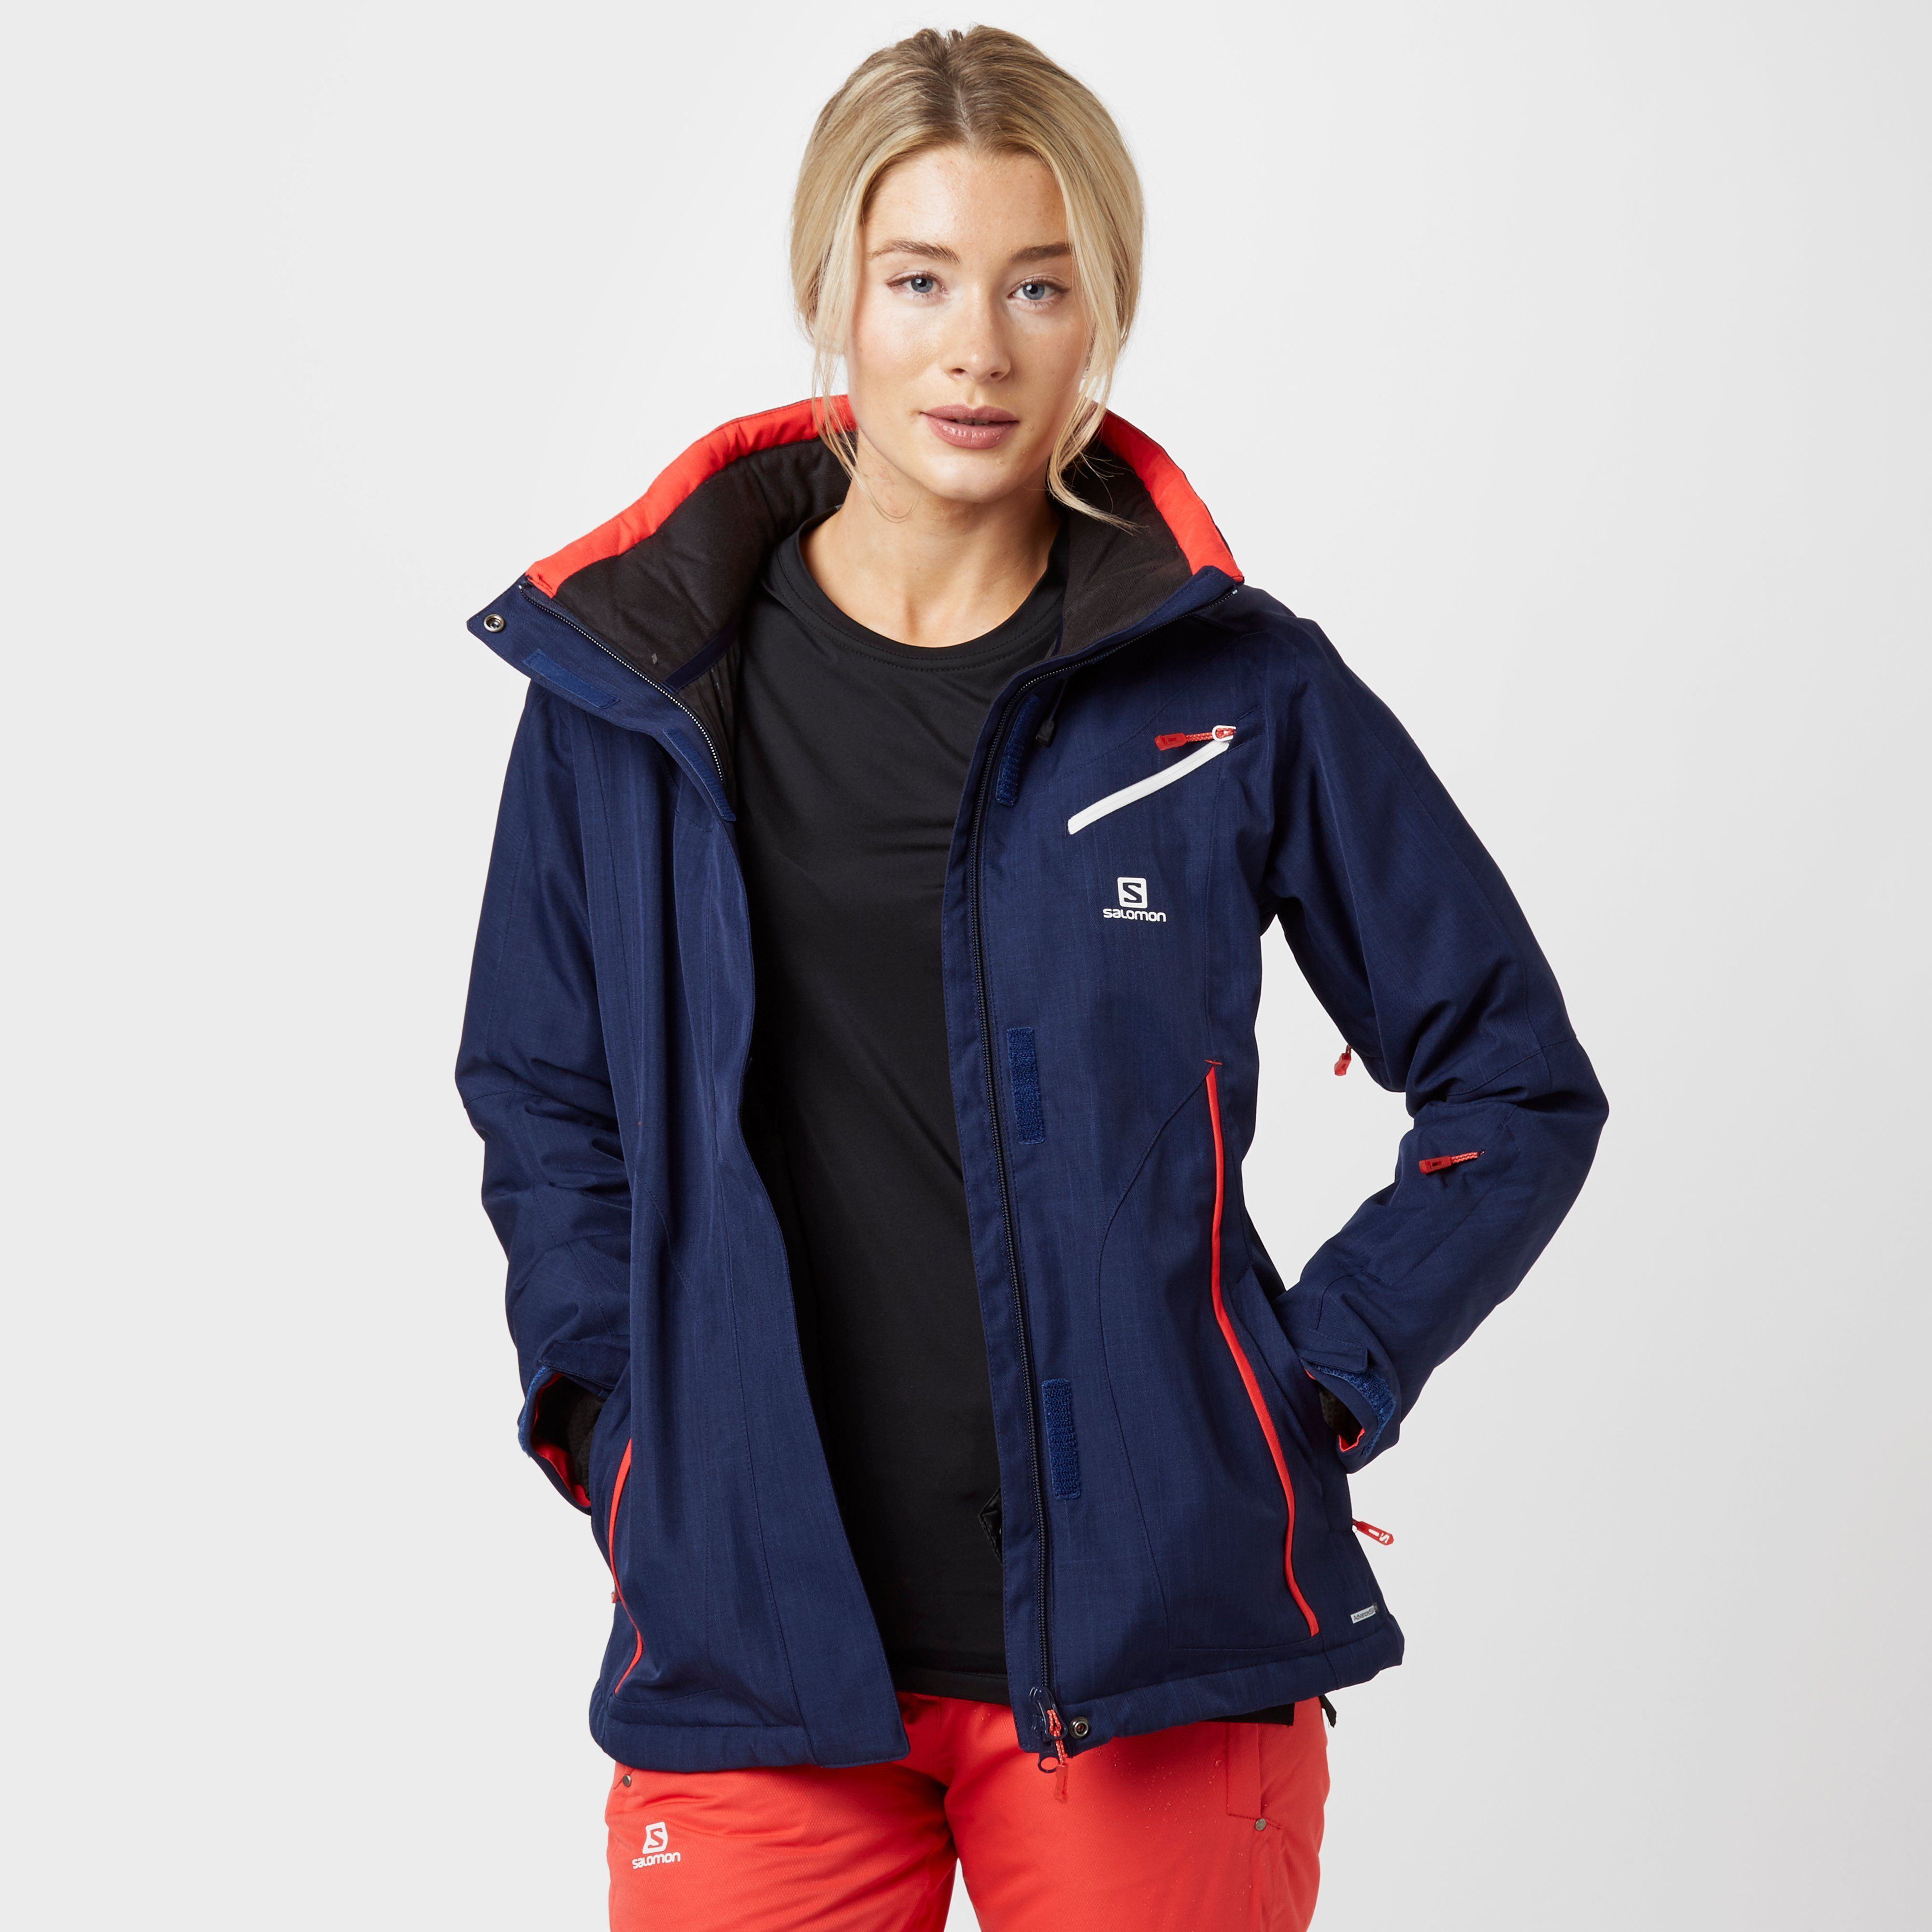 SALOMON Women's Fantasy Ski Jacket